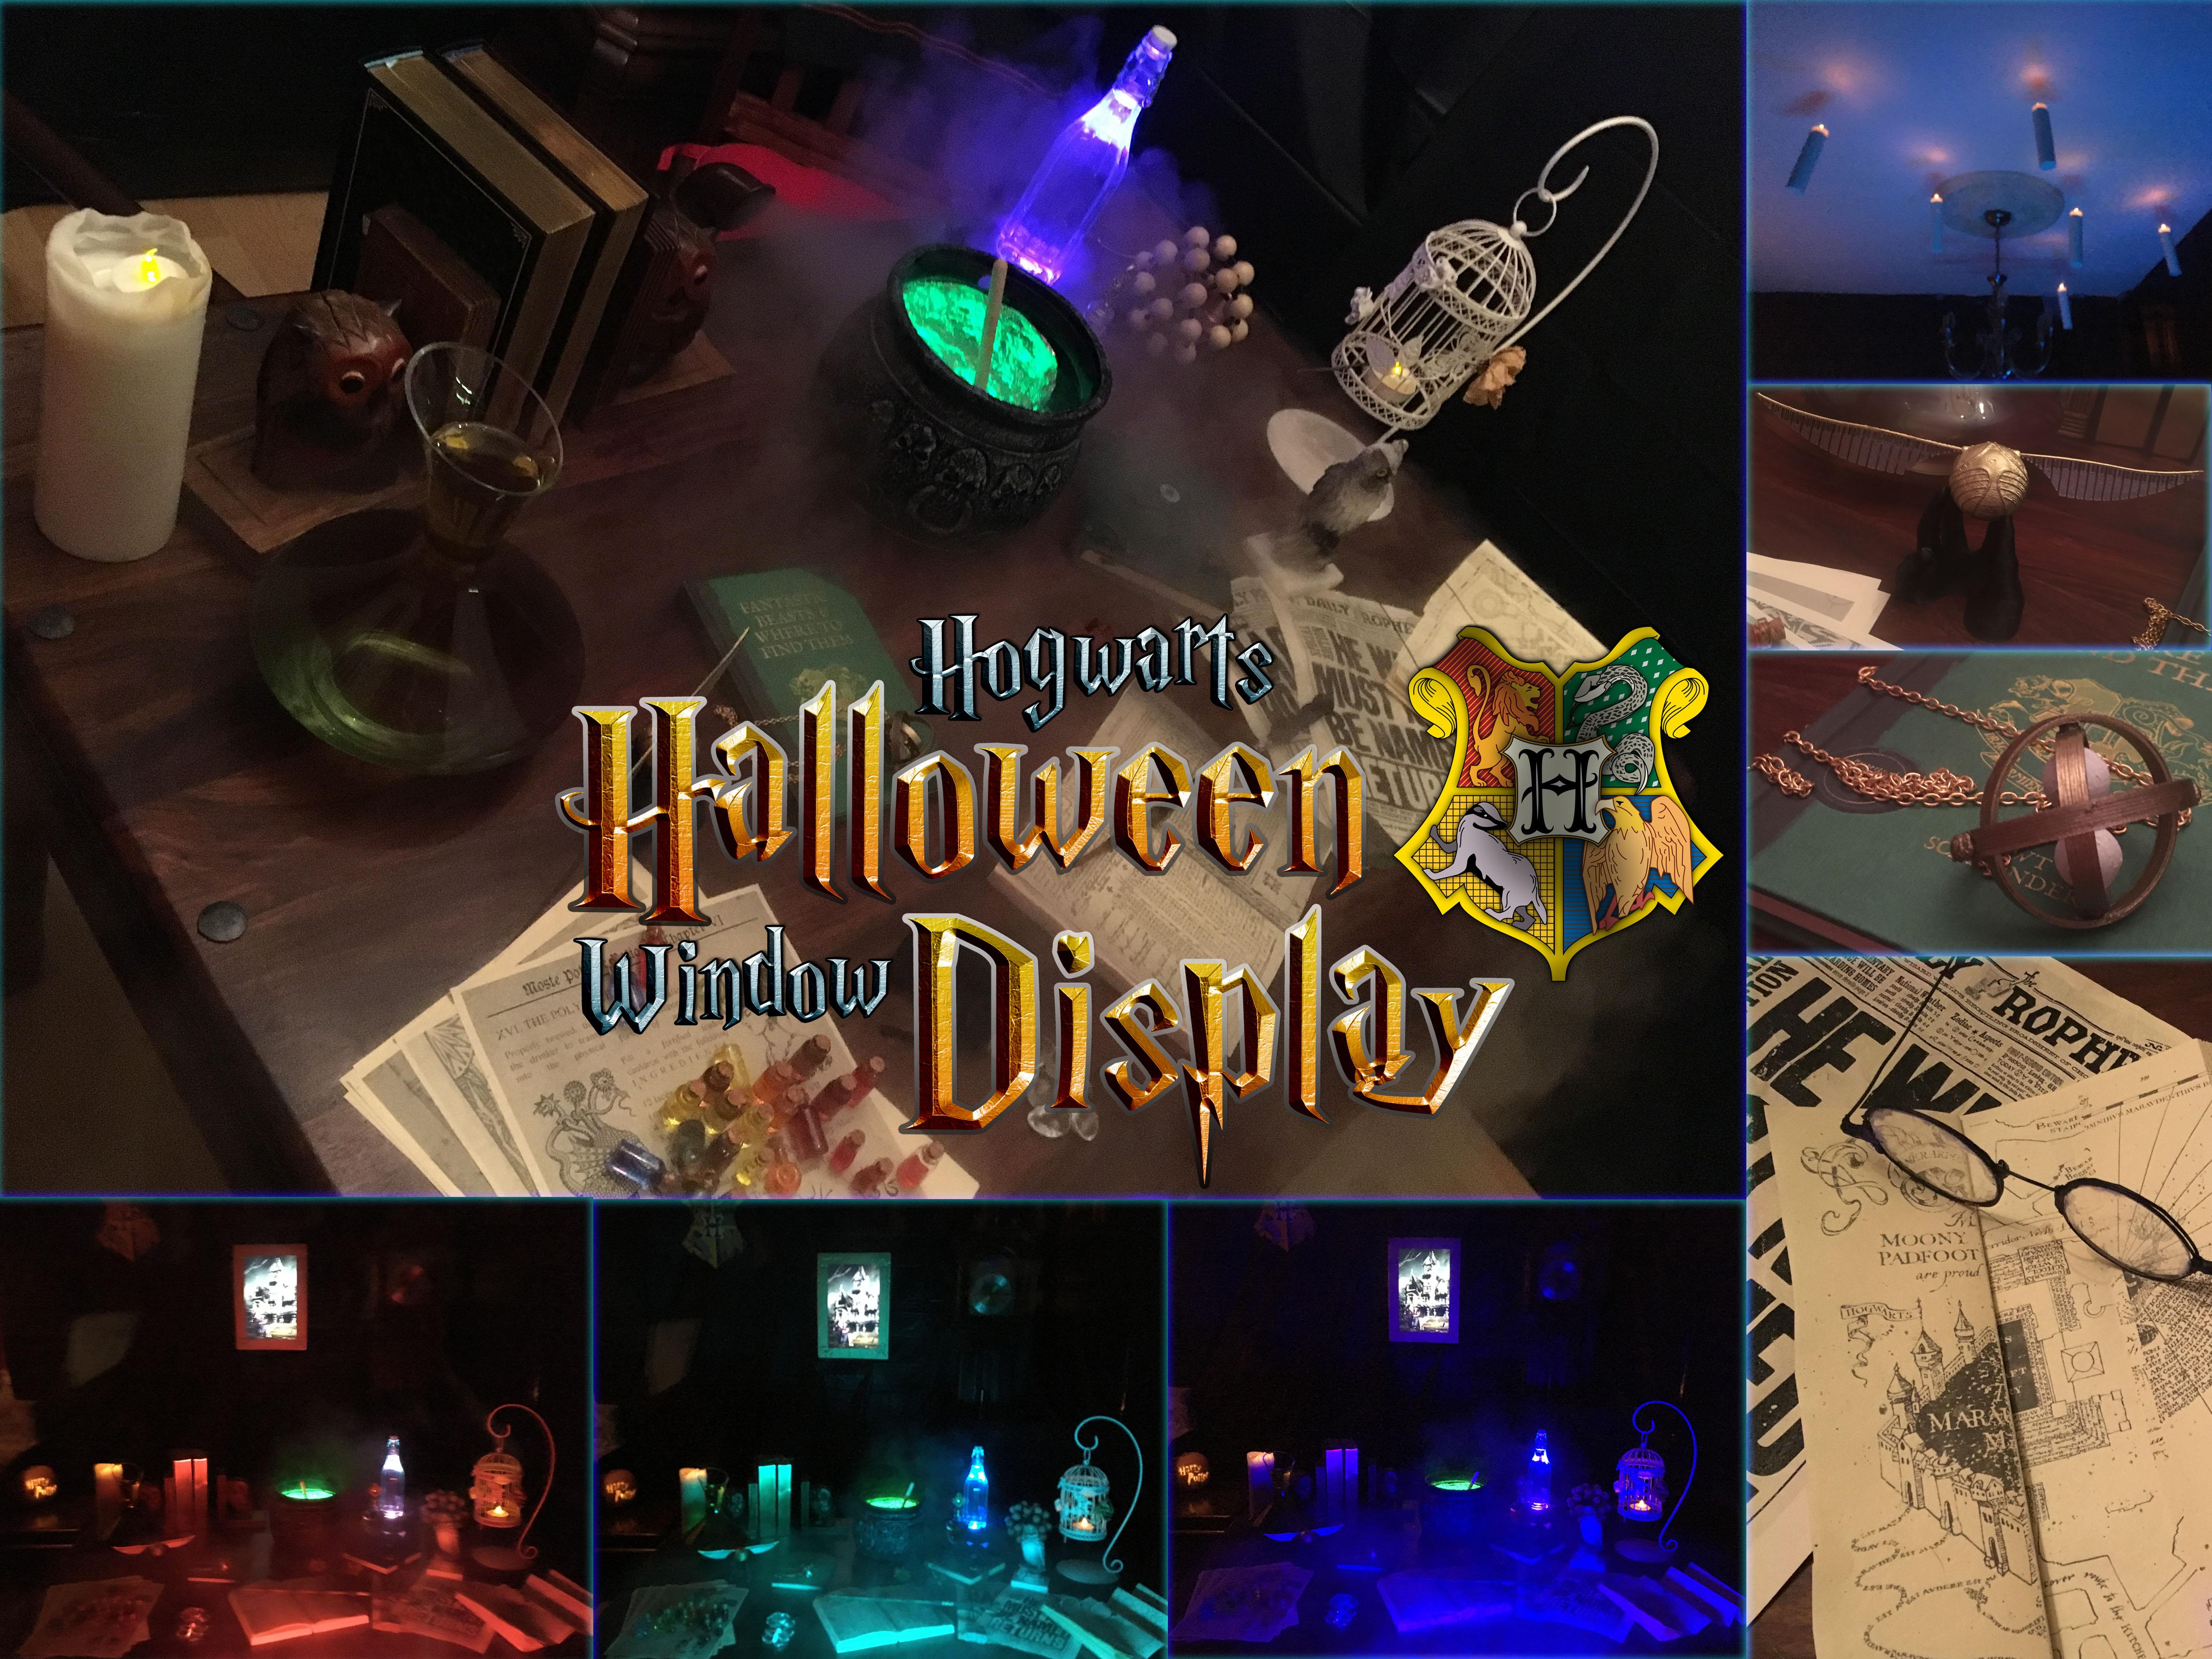 Picture of Hogwarts Halloween Window Display